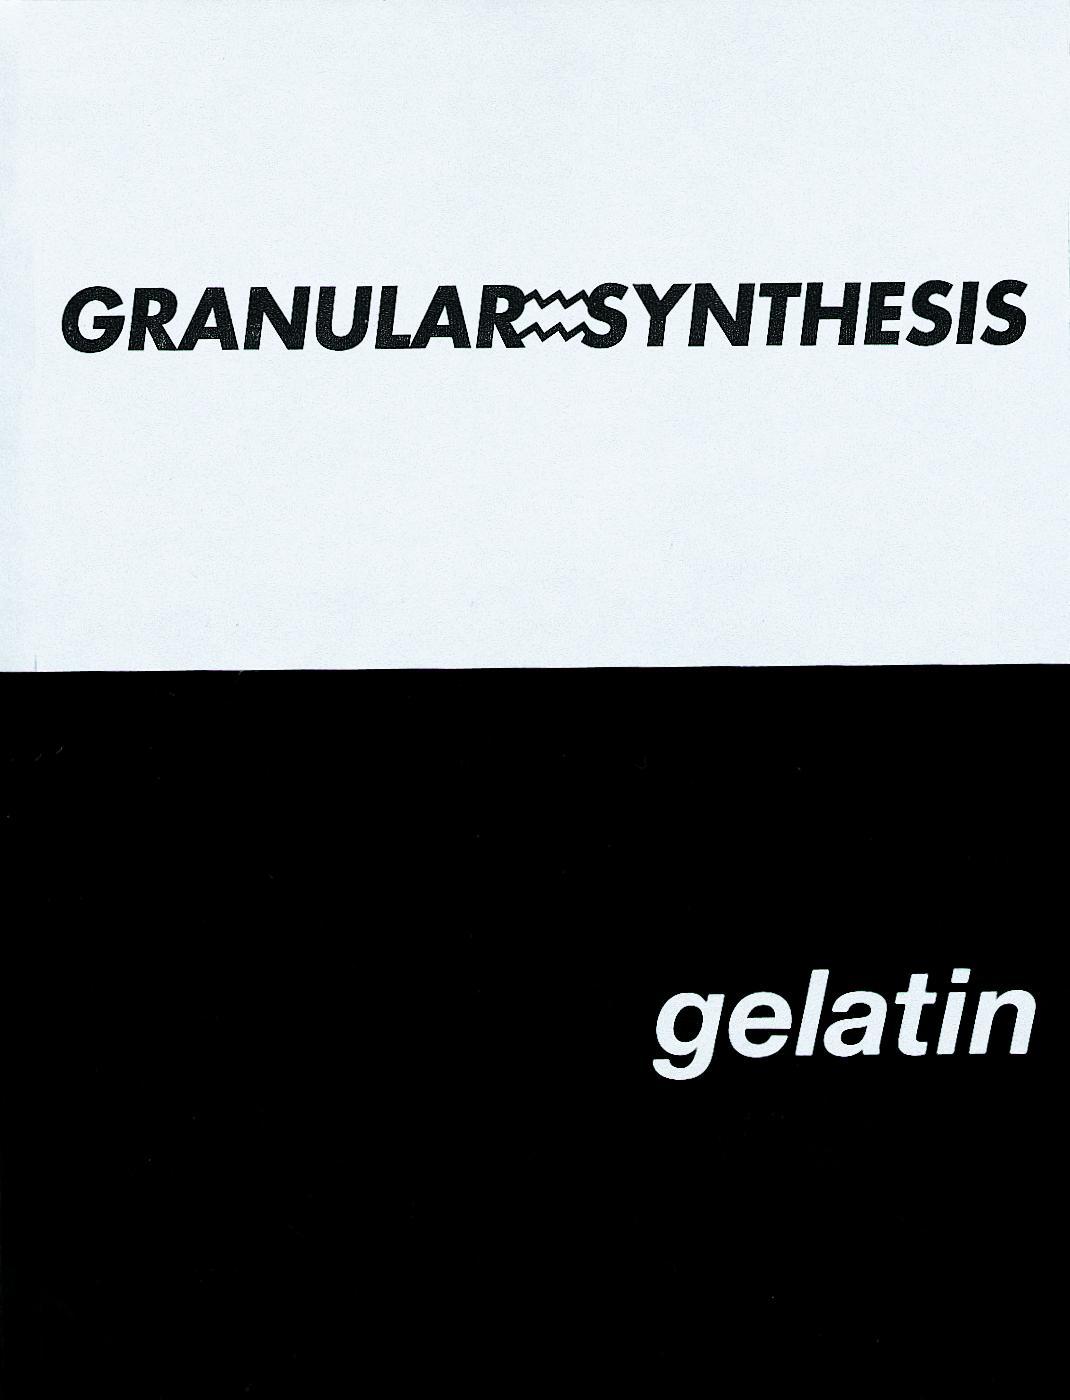 Granular=synthesis